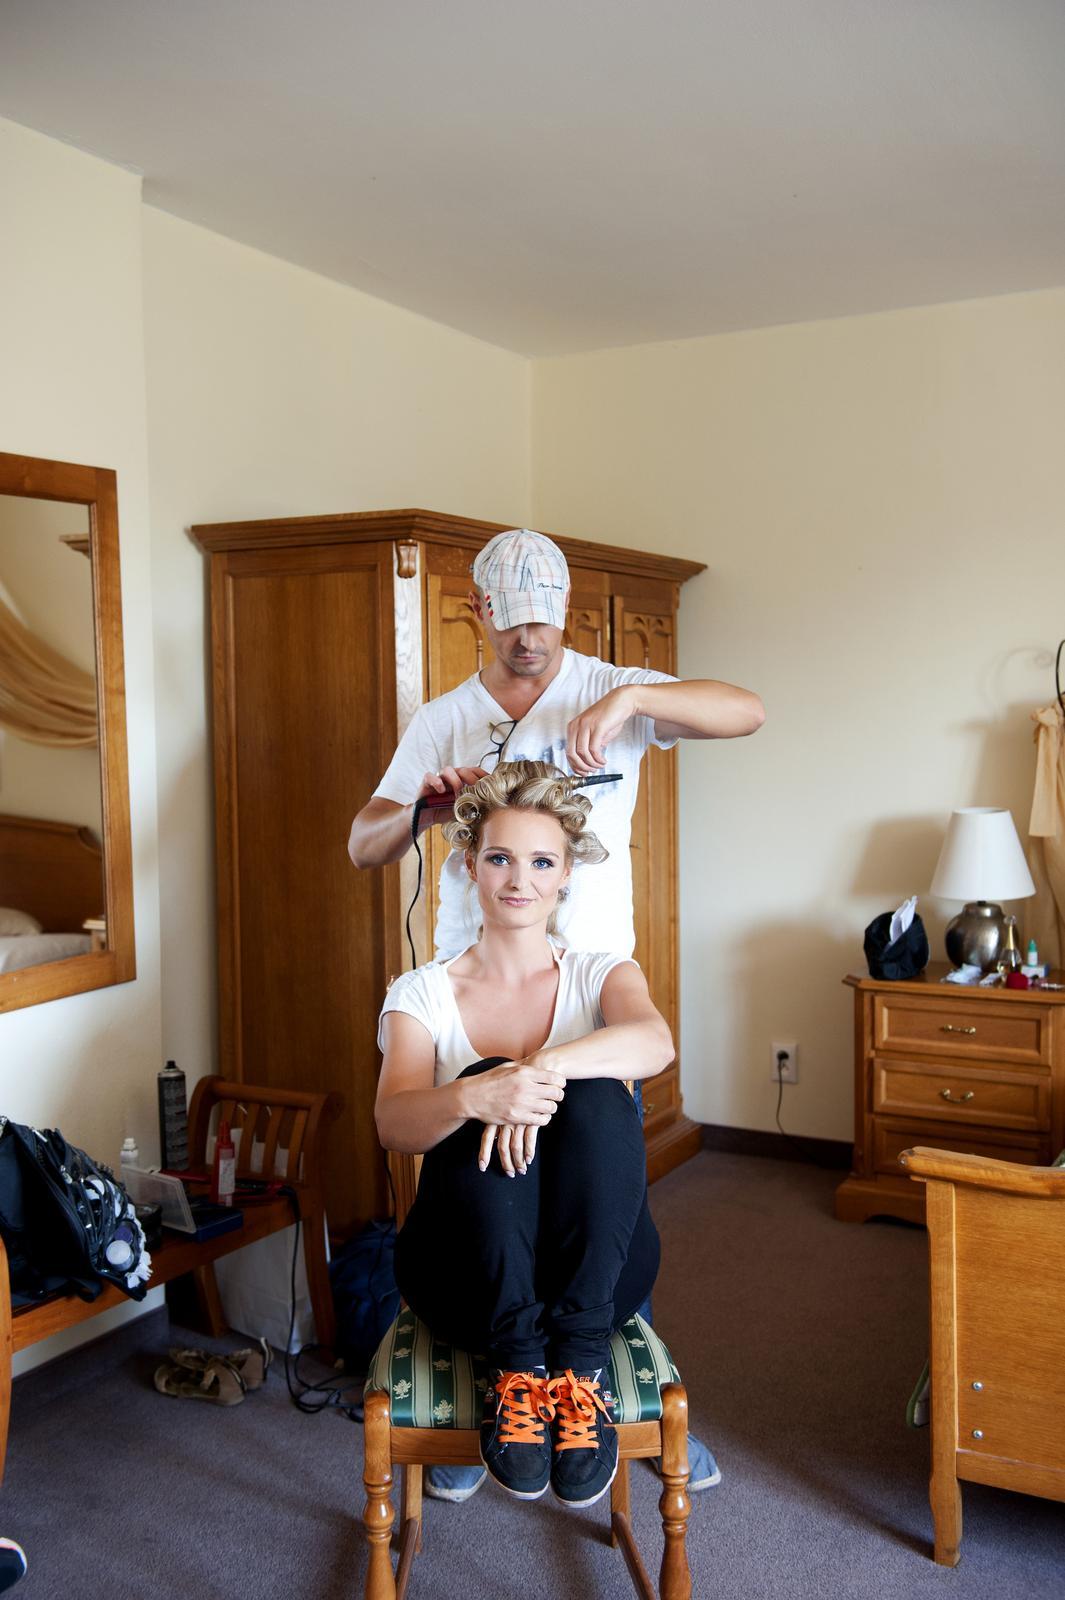 Boris Bordács make-up & hairstyle - svadobné líčenie a účes - photo: www.jstudio.sk , mua/hair: boris